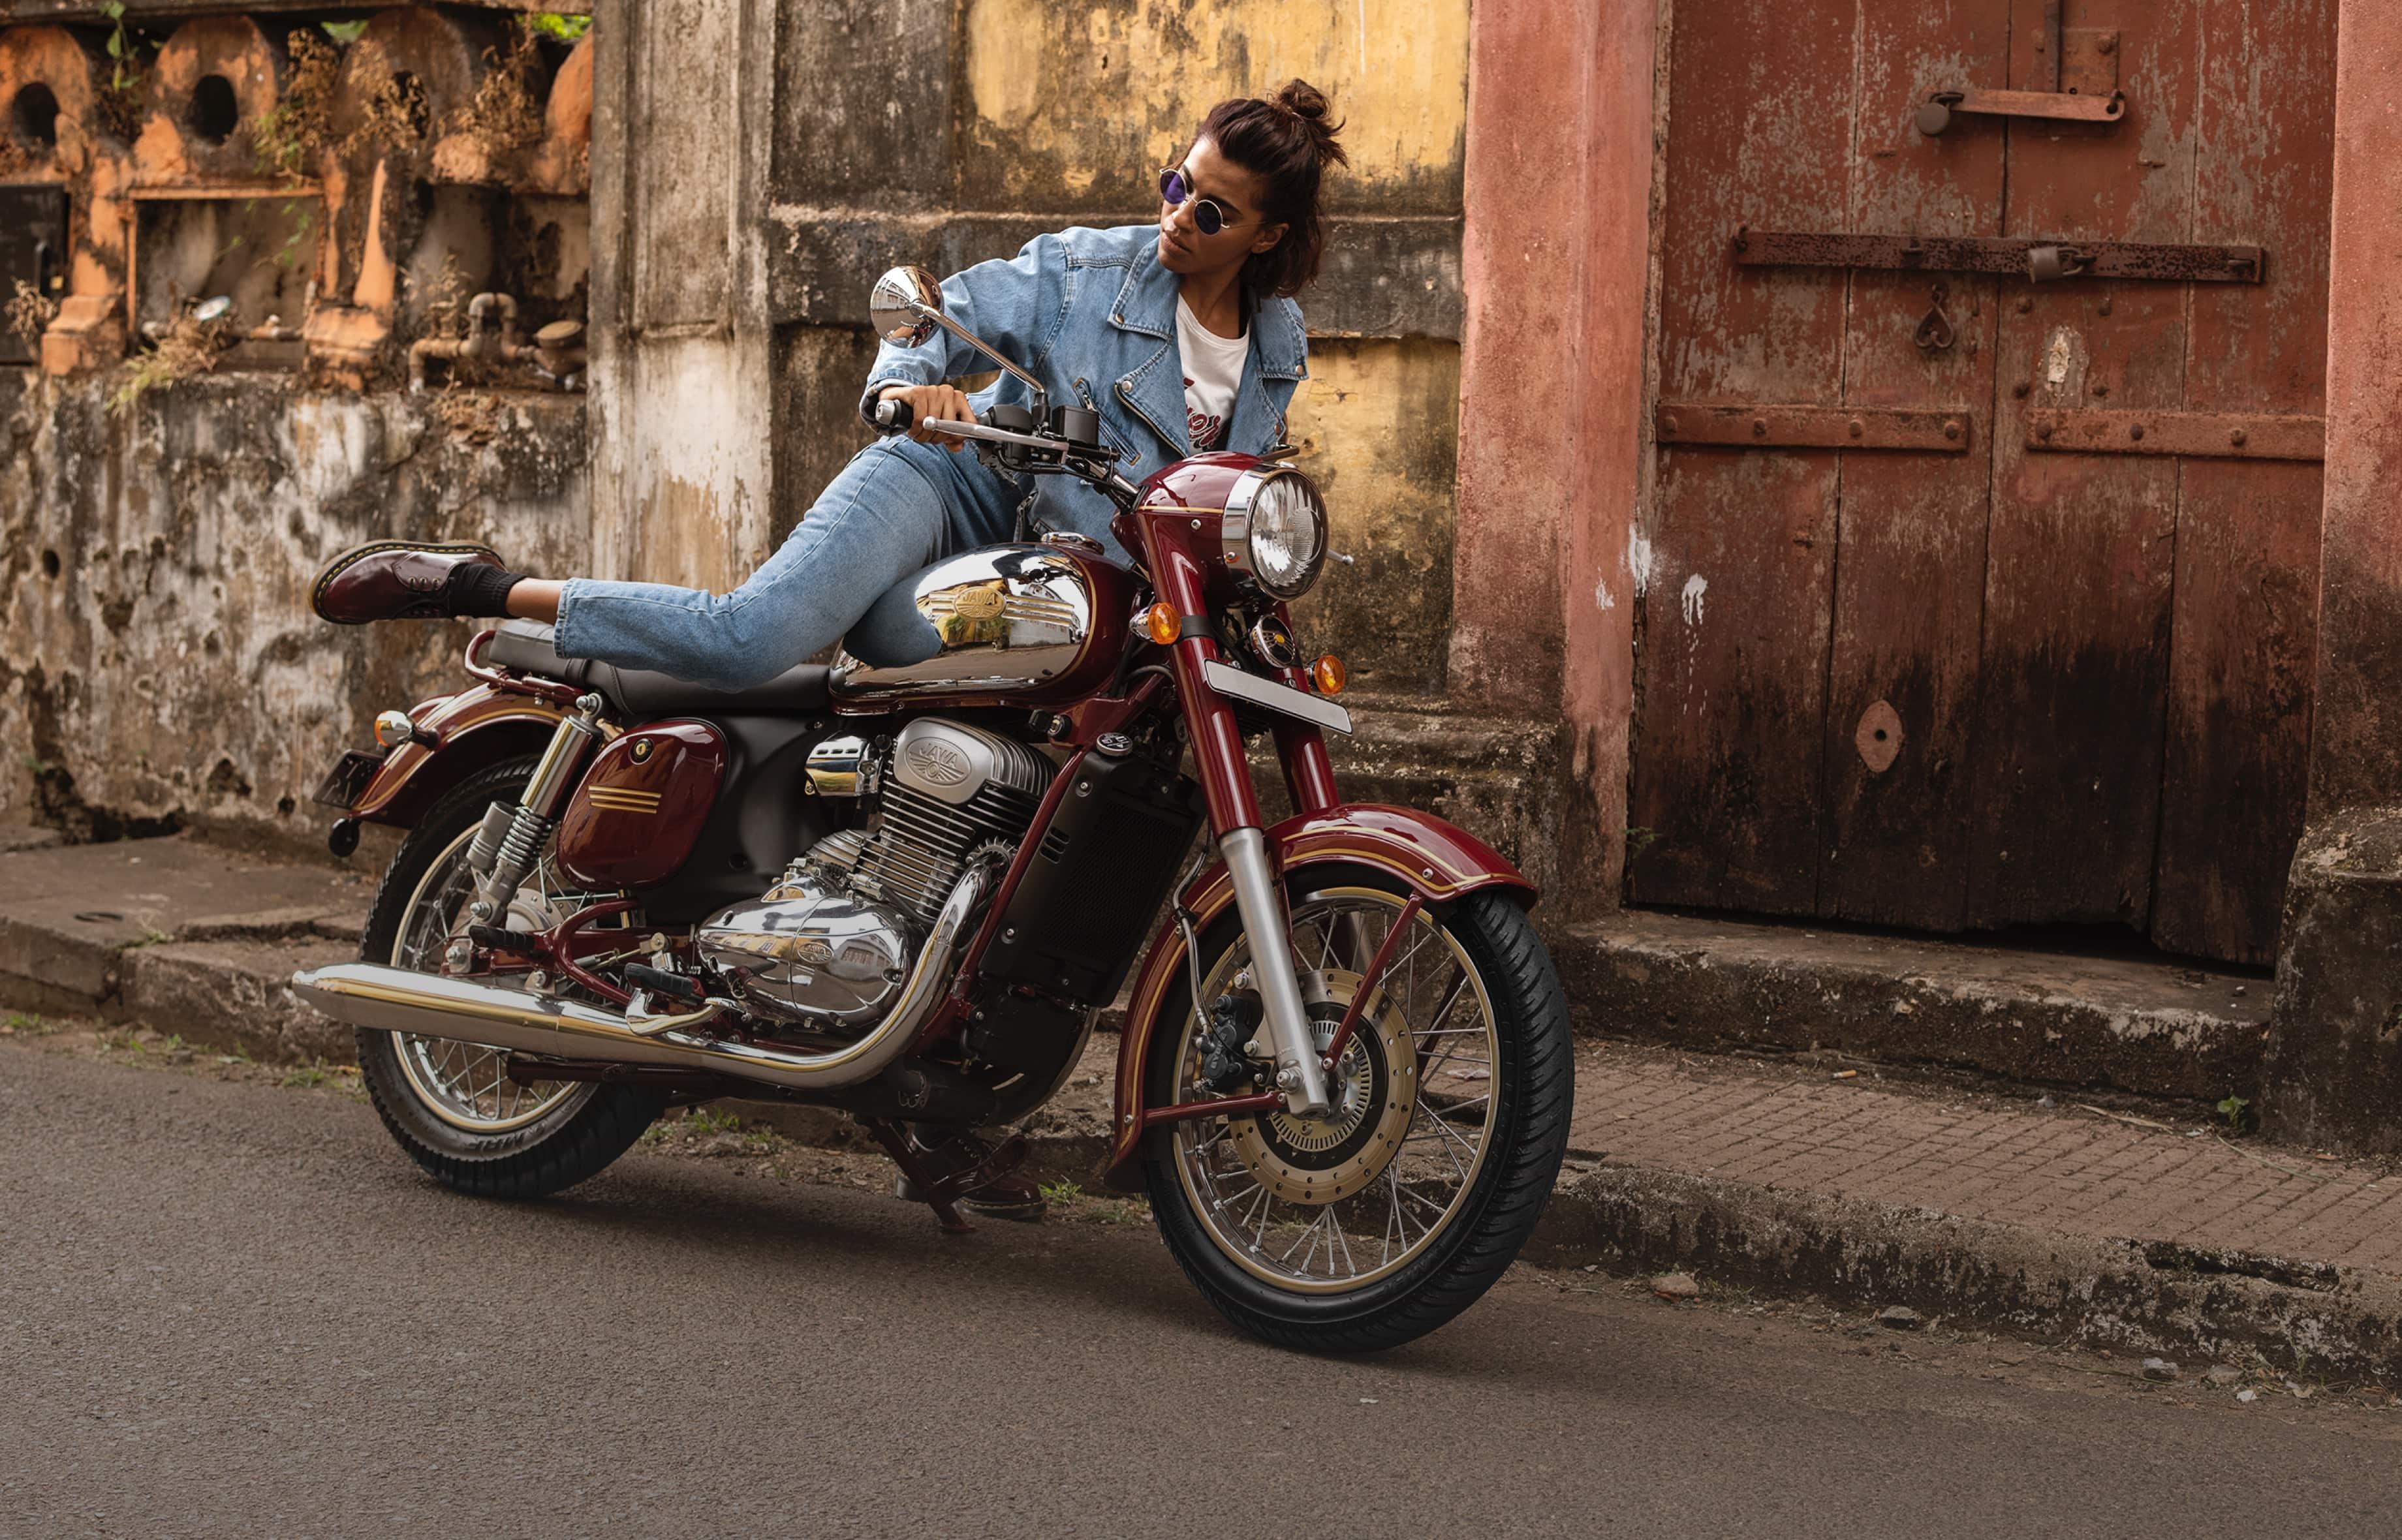 Jawa Motorcycle: Engine Transmission